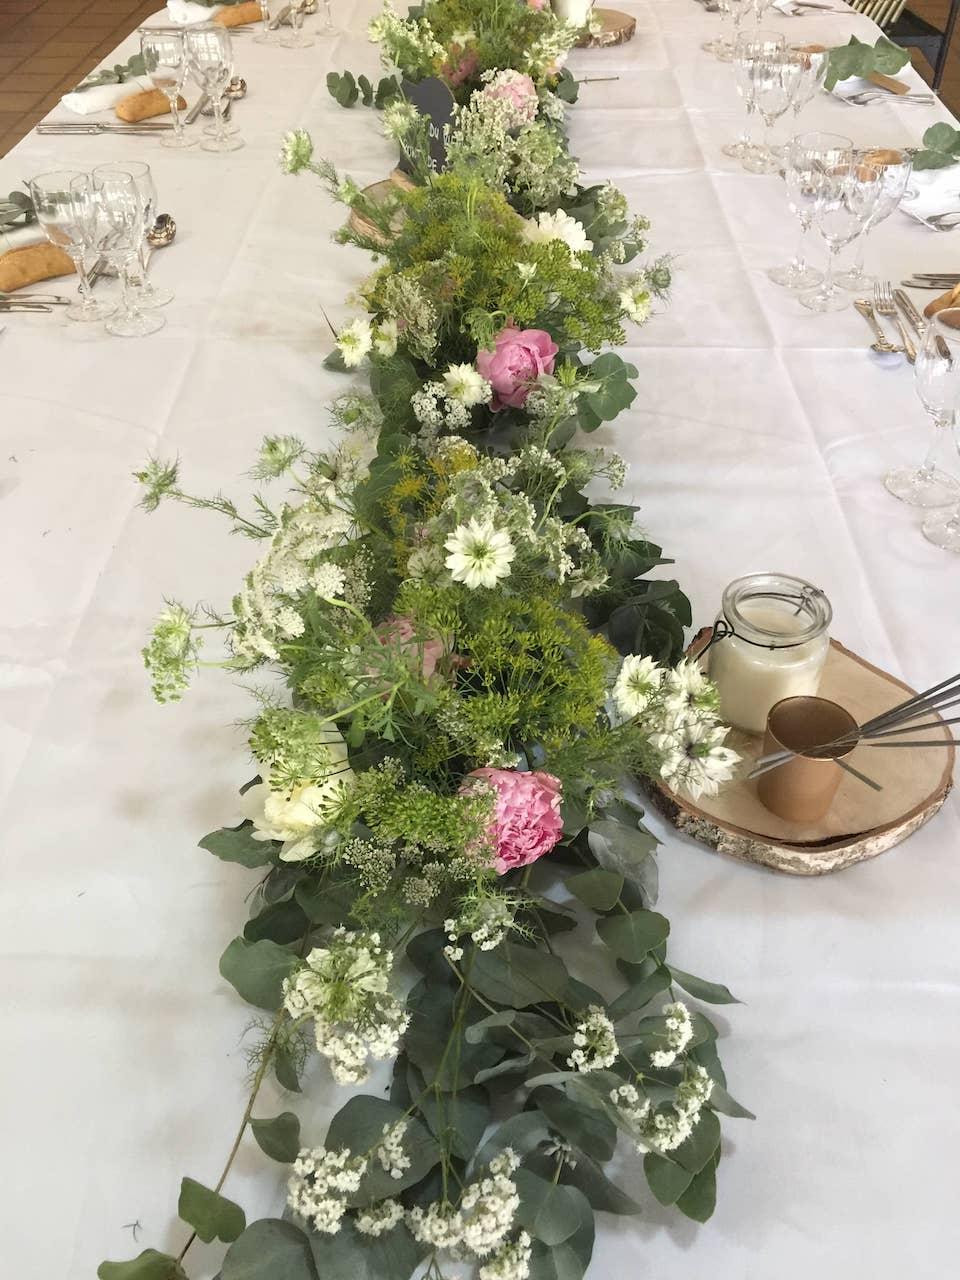 lieu-reception-chemin-table-champetre-pastel-mariage